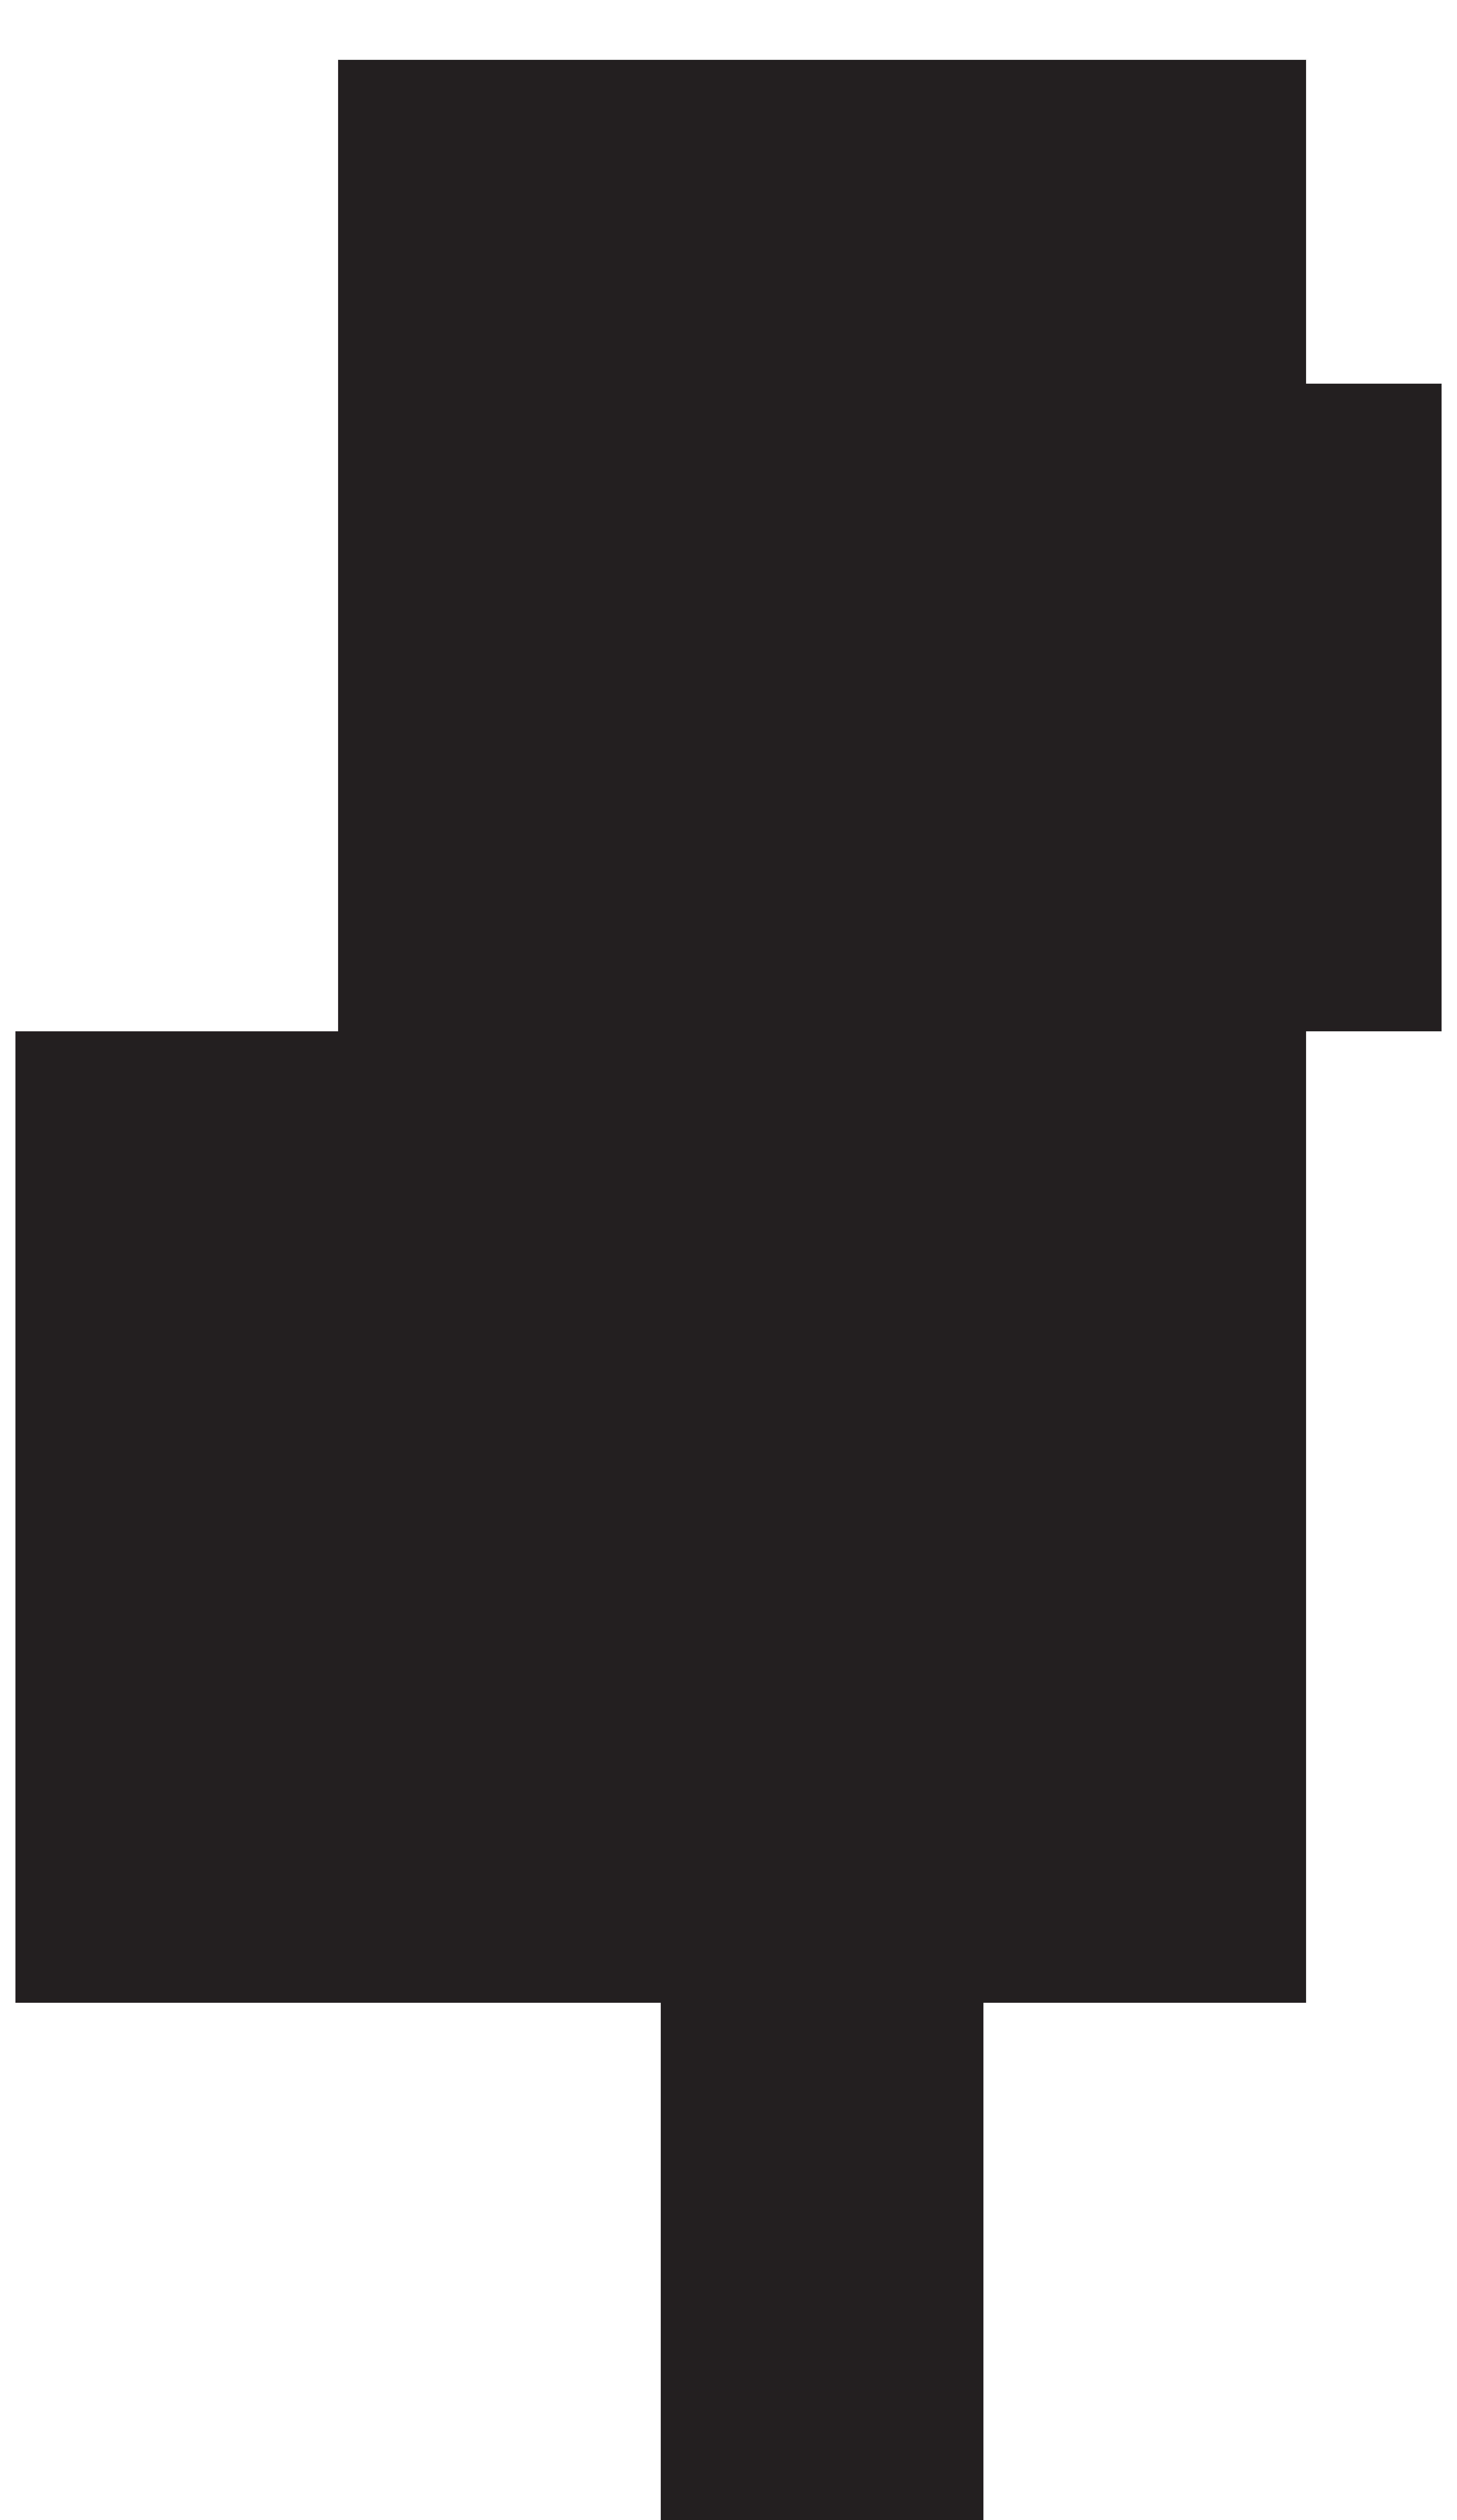 Rose Silhouette PNG Transparent Clip Art Image.